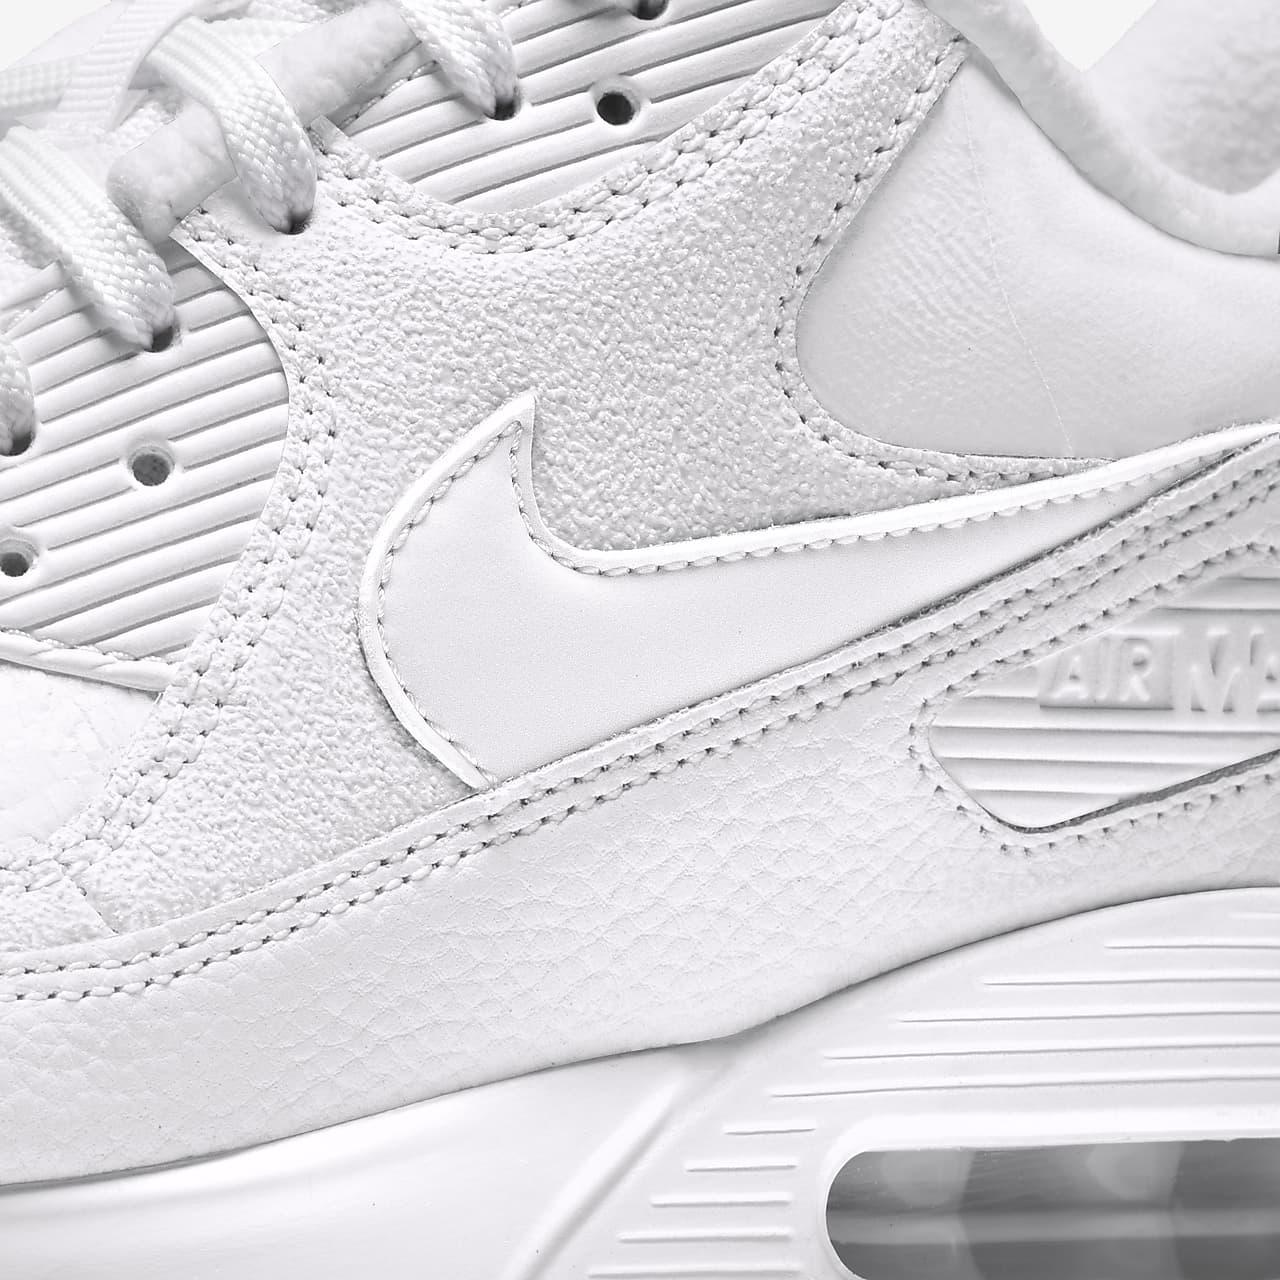 Nike Air Max 90 iD Winter White Men's